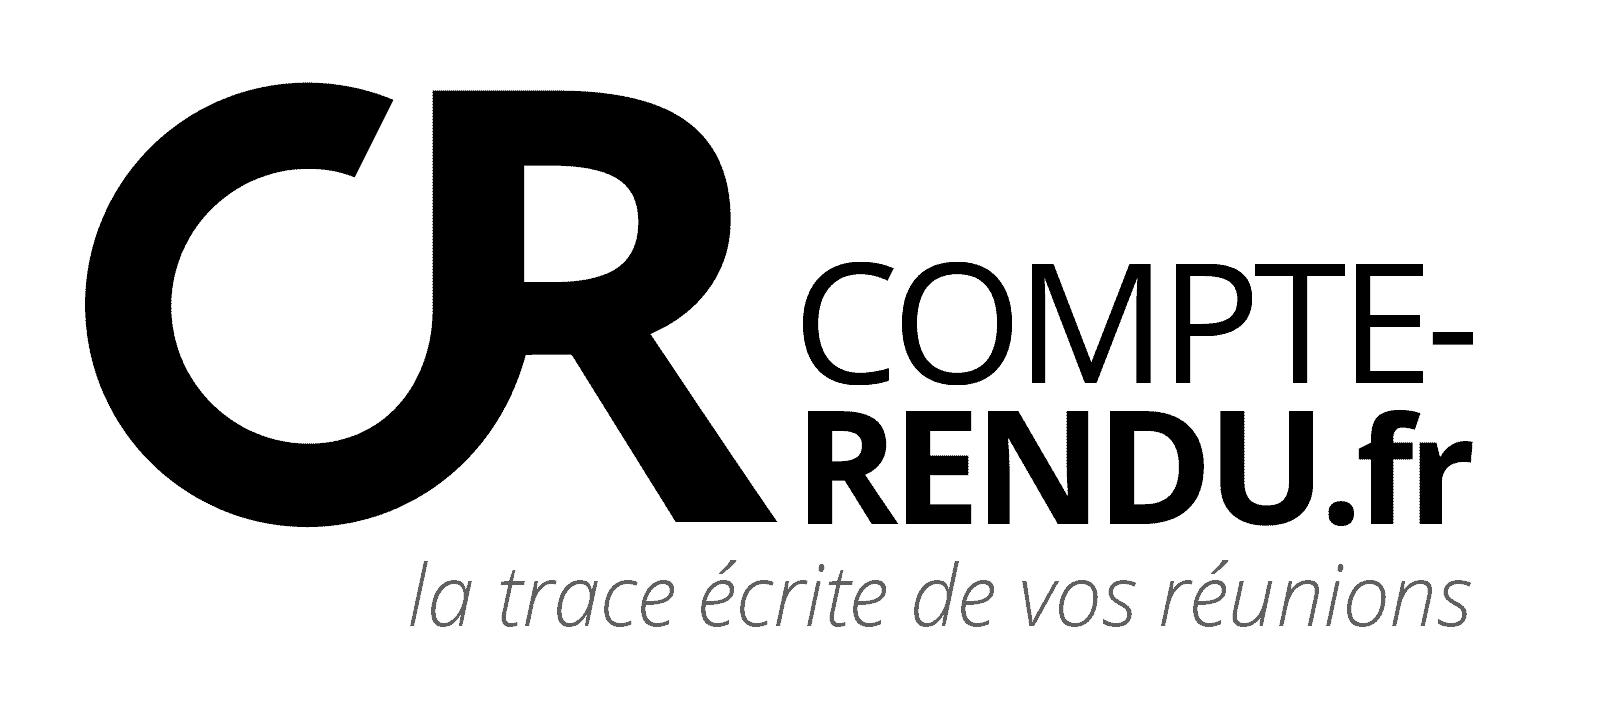 compte rendu fr logo